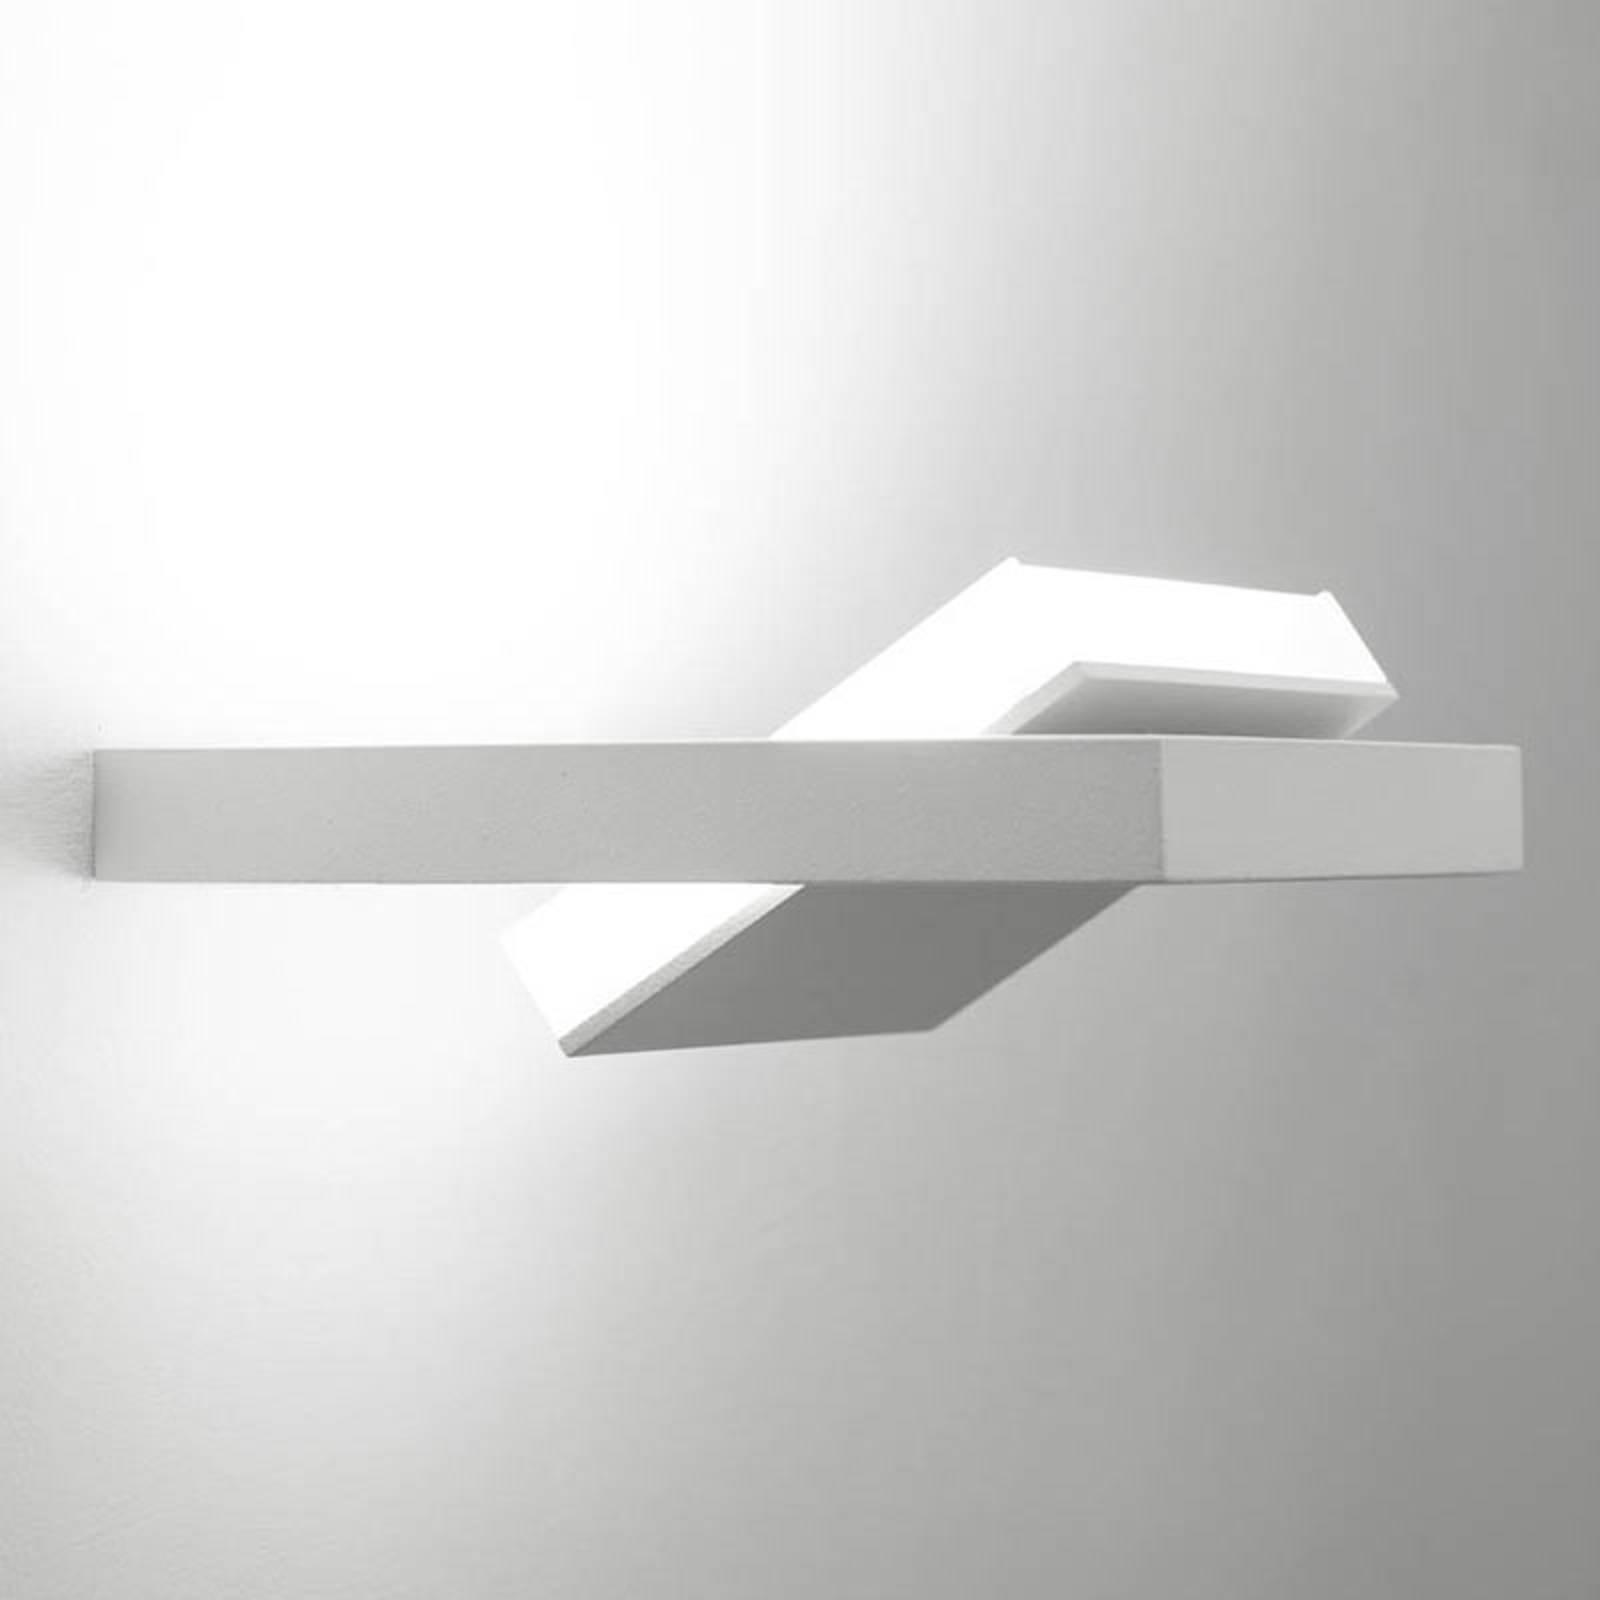 LED-Wandleuchte Tablet W1, Breite 16 cm, weiß